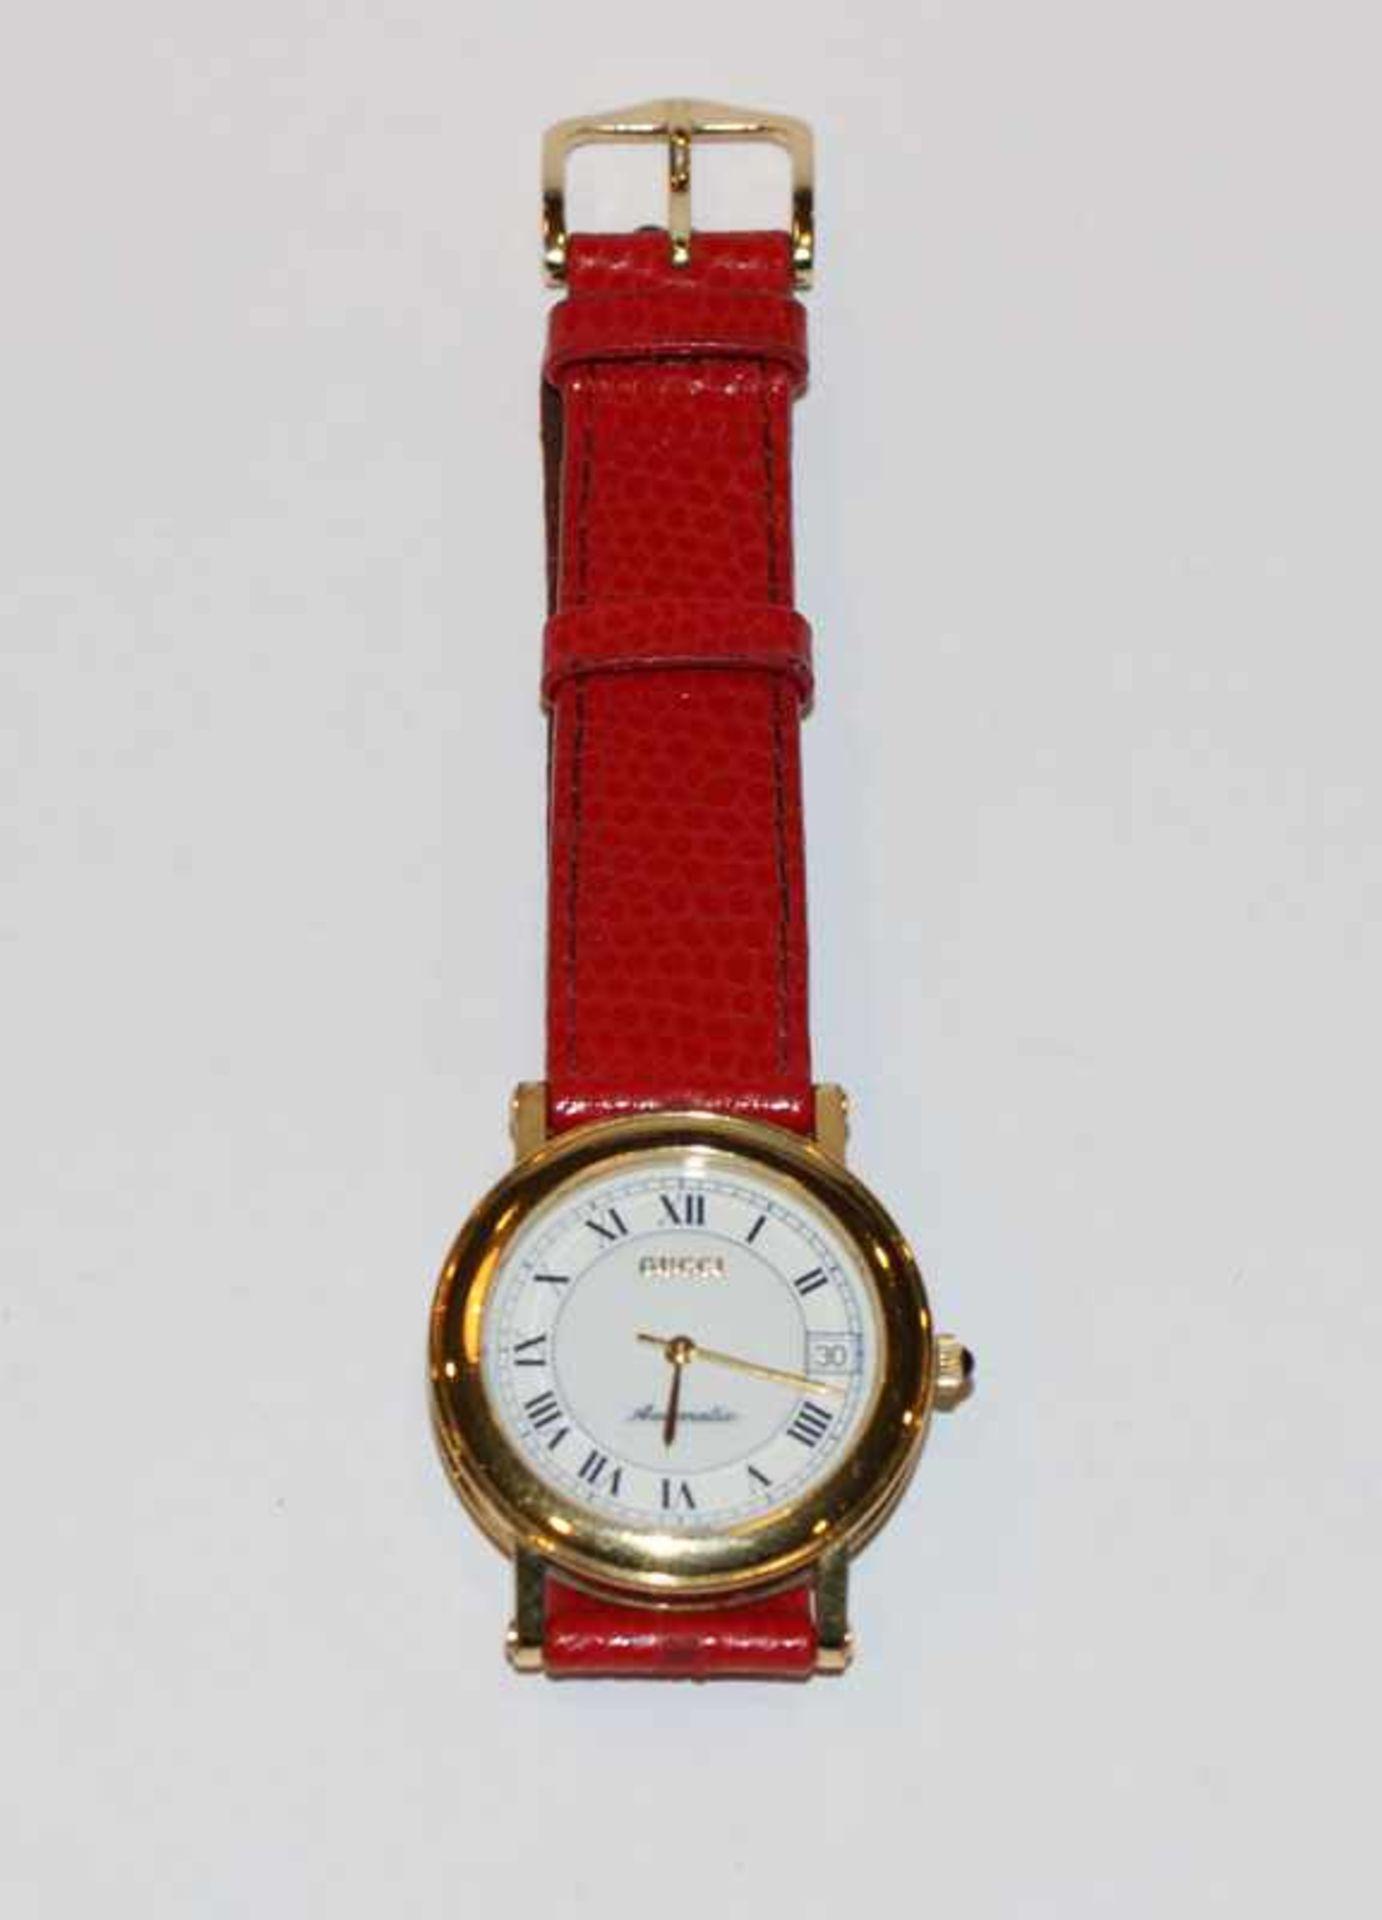 Los 67 - Gucci Damenarmbanduhr, Automatik, an rotem Armband, in Originaletui, leichte Tragespuren